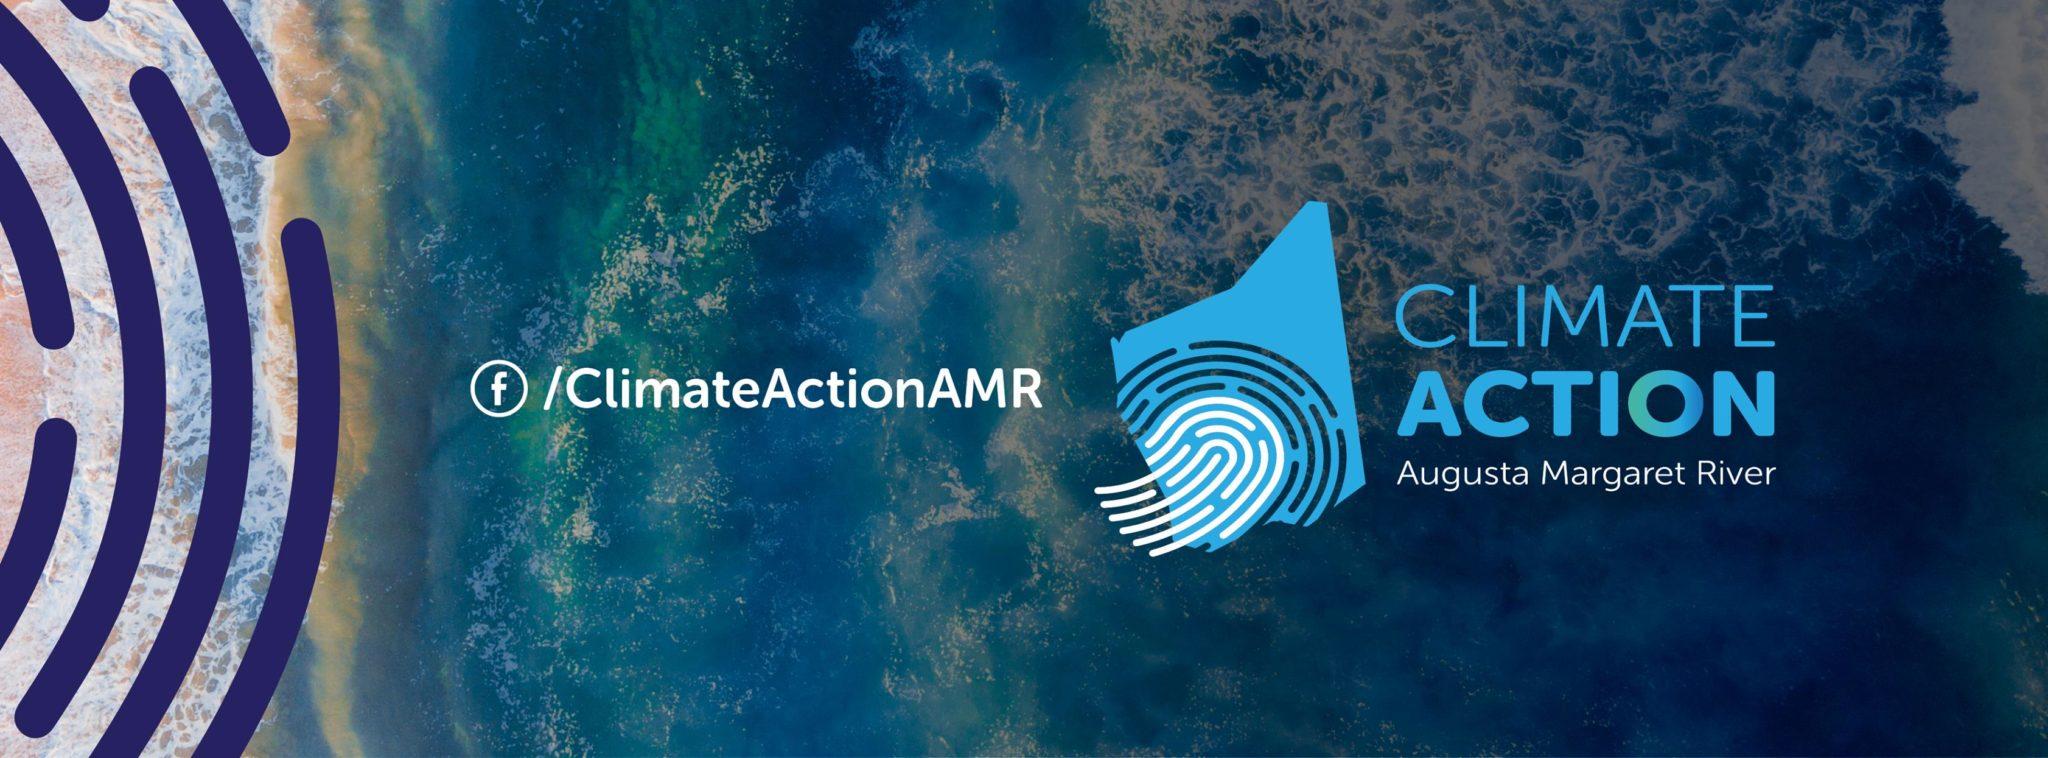 Climate Action Augusta Margaret River Community Forums